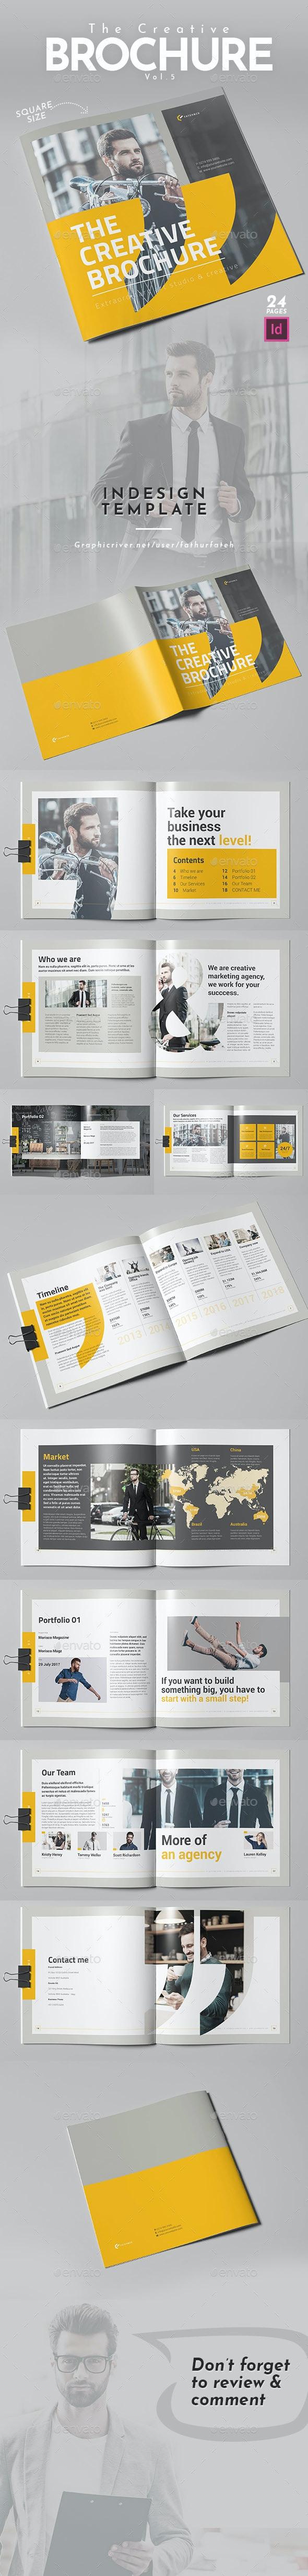 The Creative Brochure Vol.5 - Square - Corporate Brochures